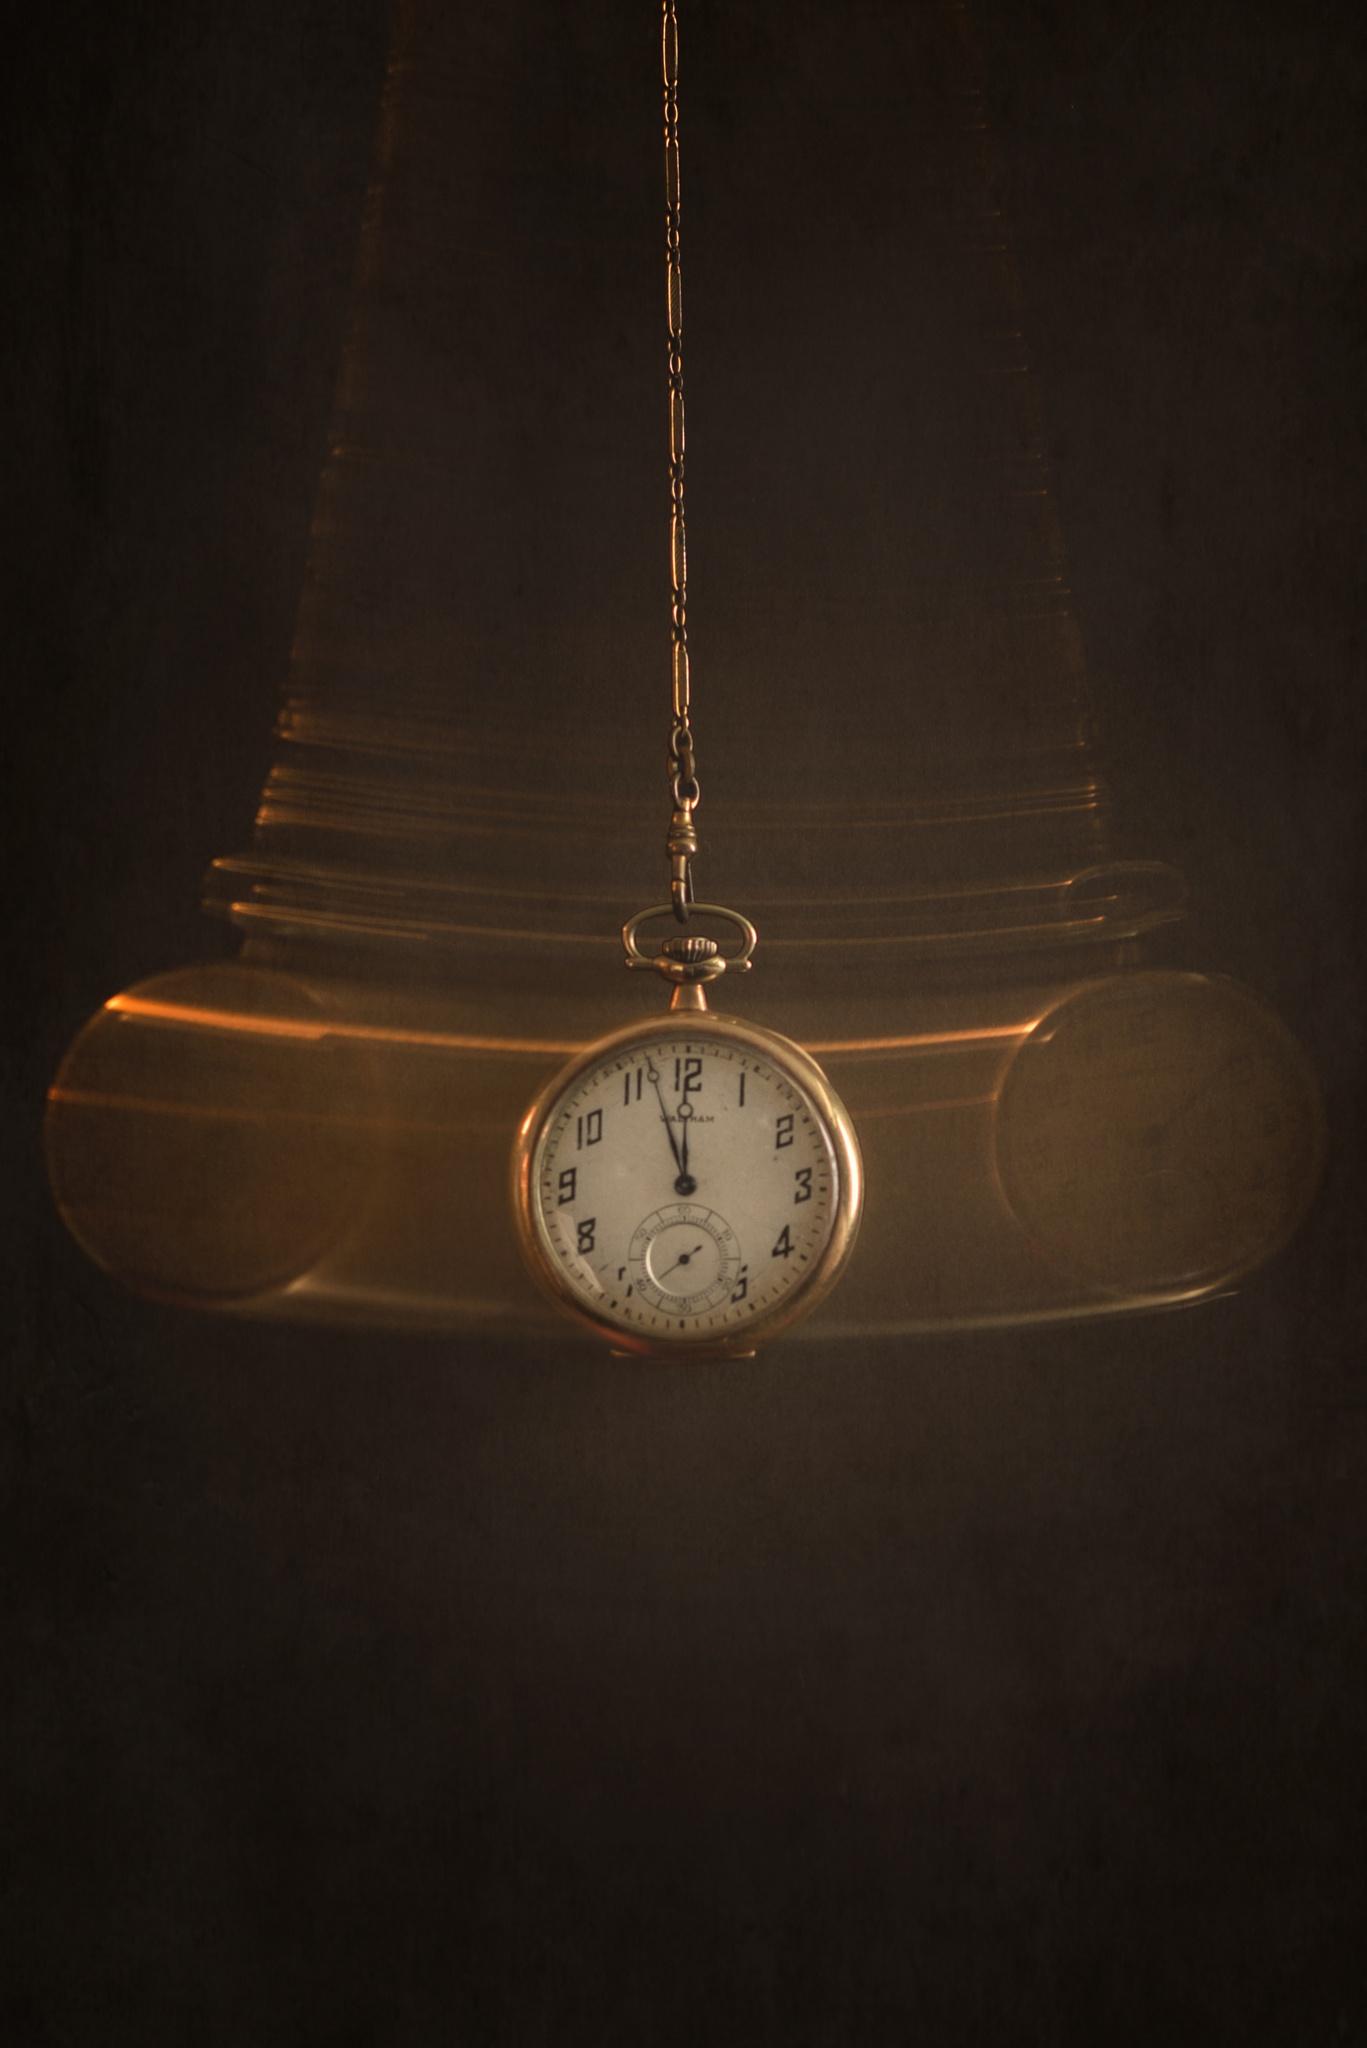 Pendulum by Nikki Roloff